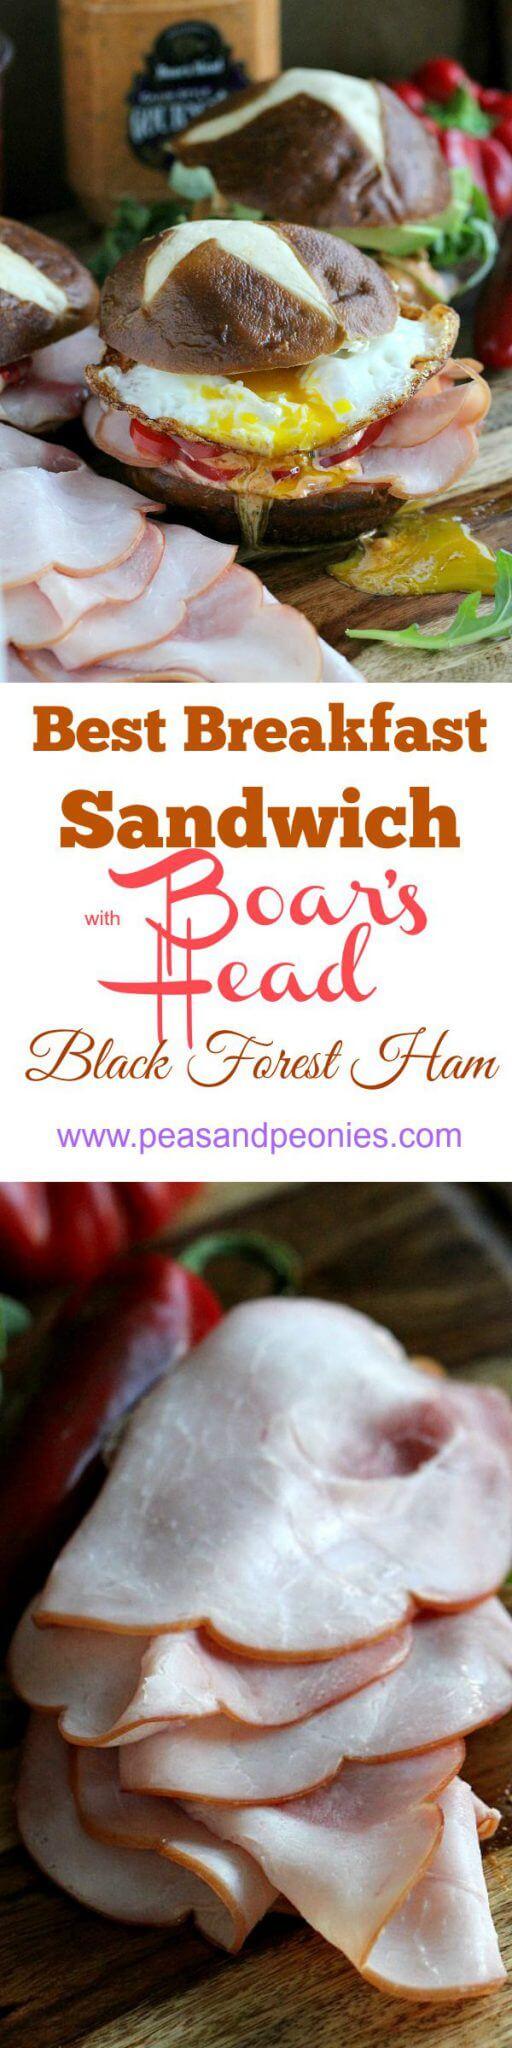 Boar's Head black forest ham